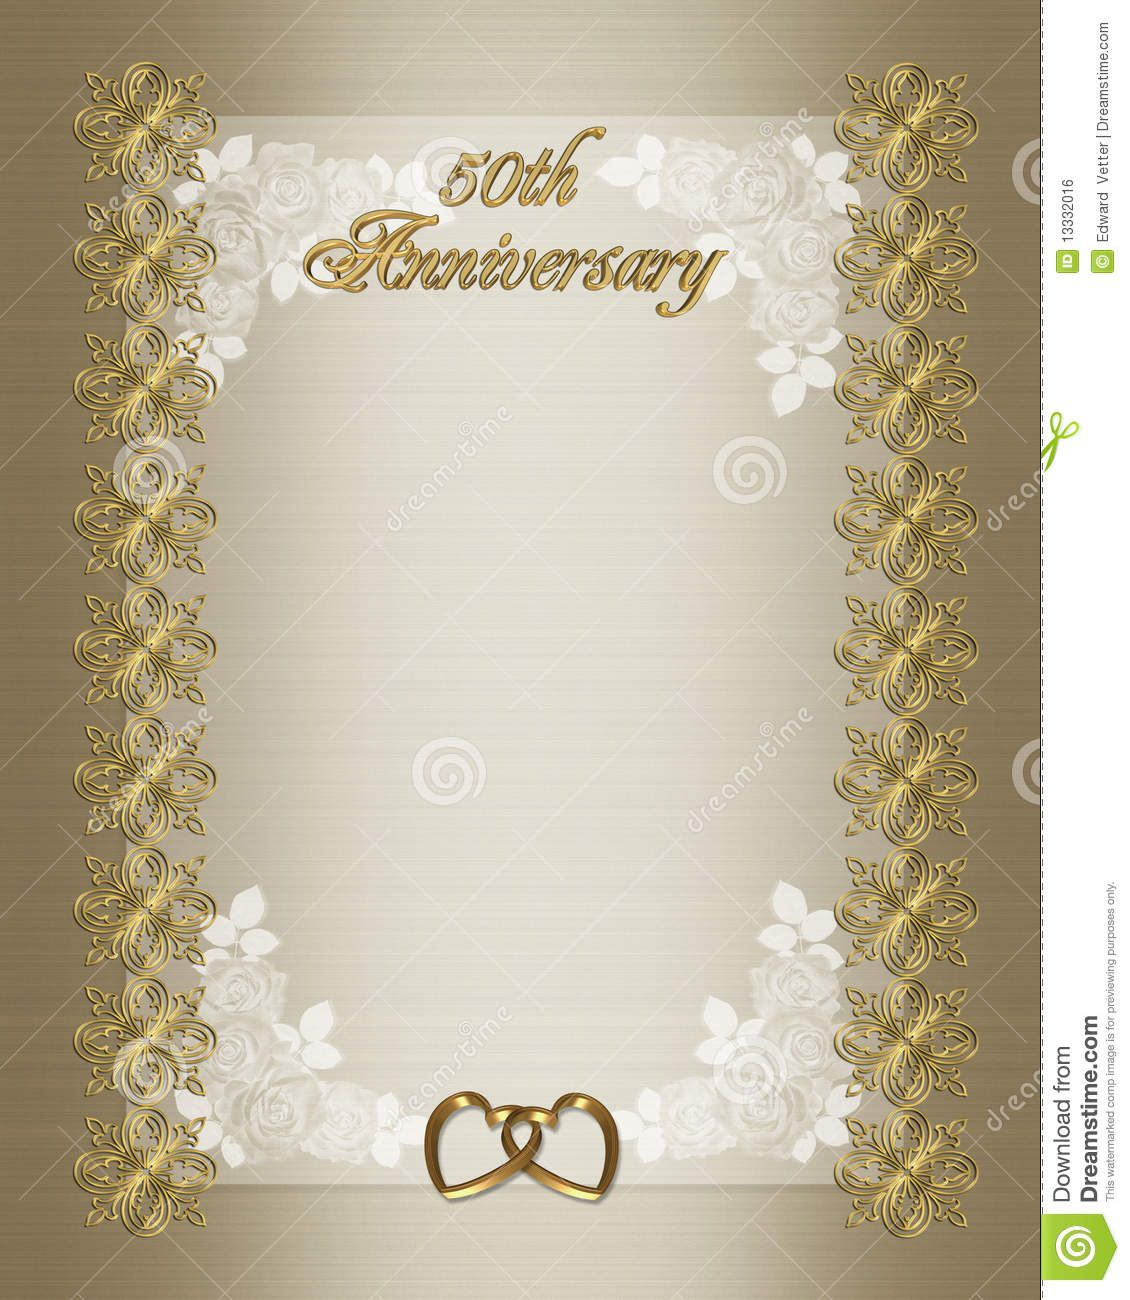 006 Fearsome 50th Anniversary Invitation Template Idea  Wedding Microsoft Word Free DownloadFull